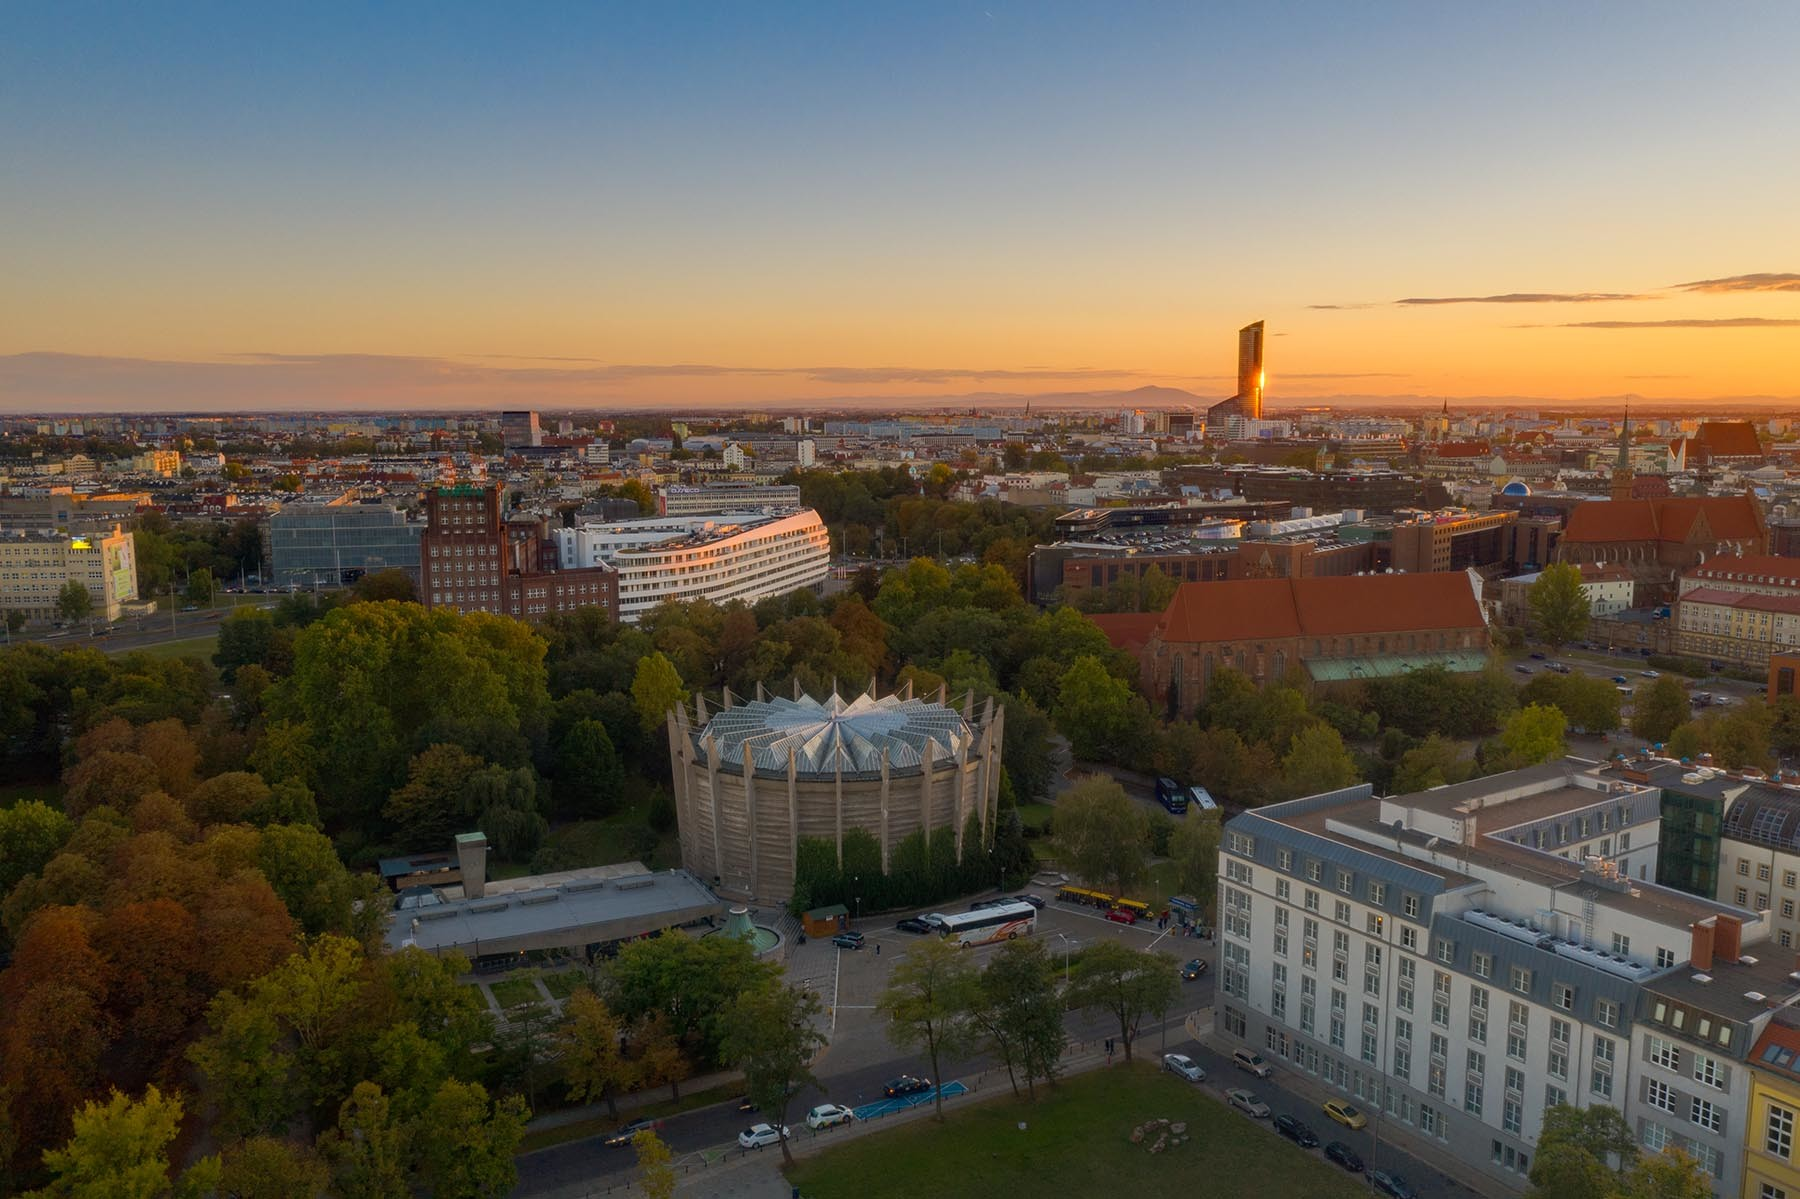 Panorama Wocławia